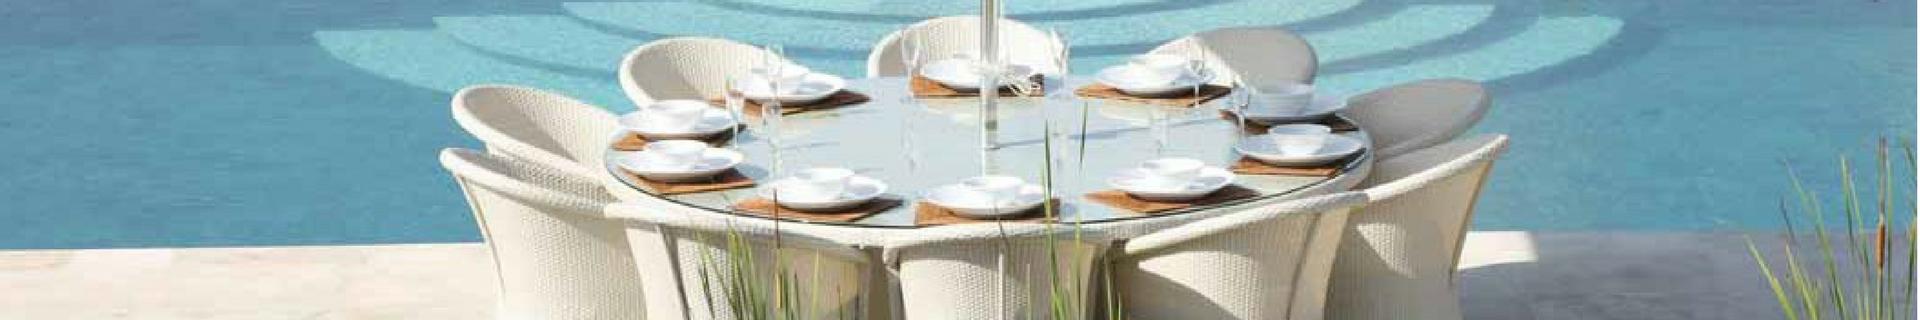 Alfresco Dining Sets